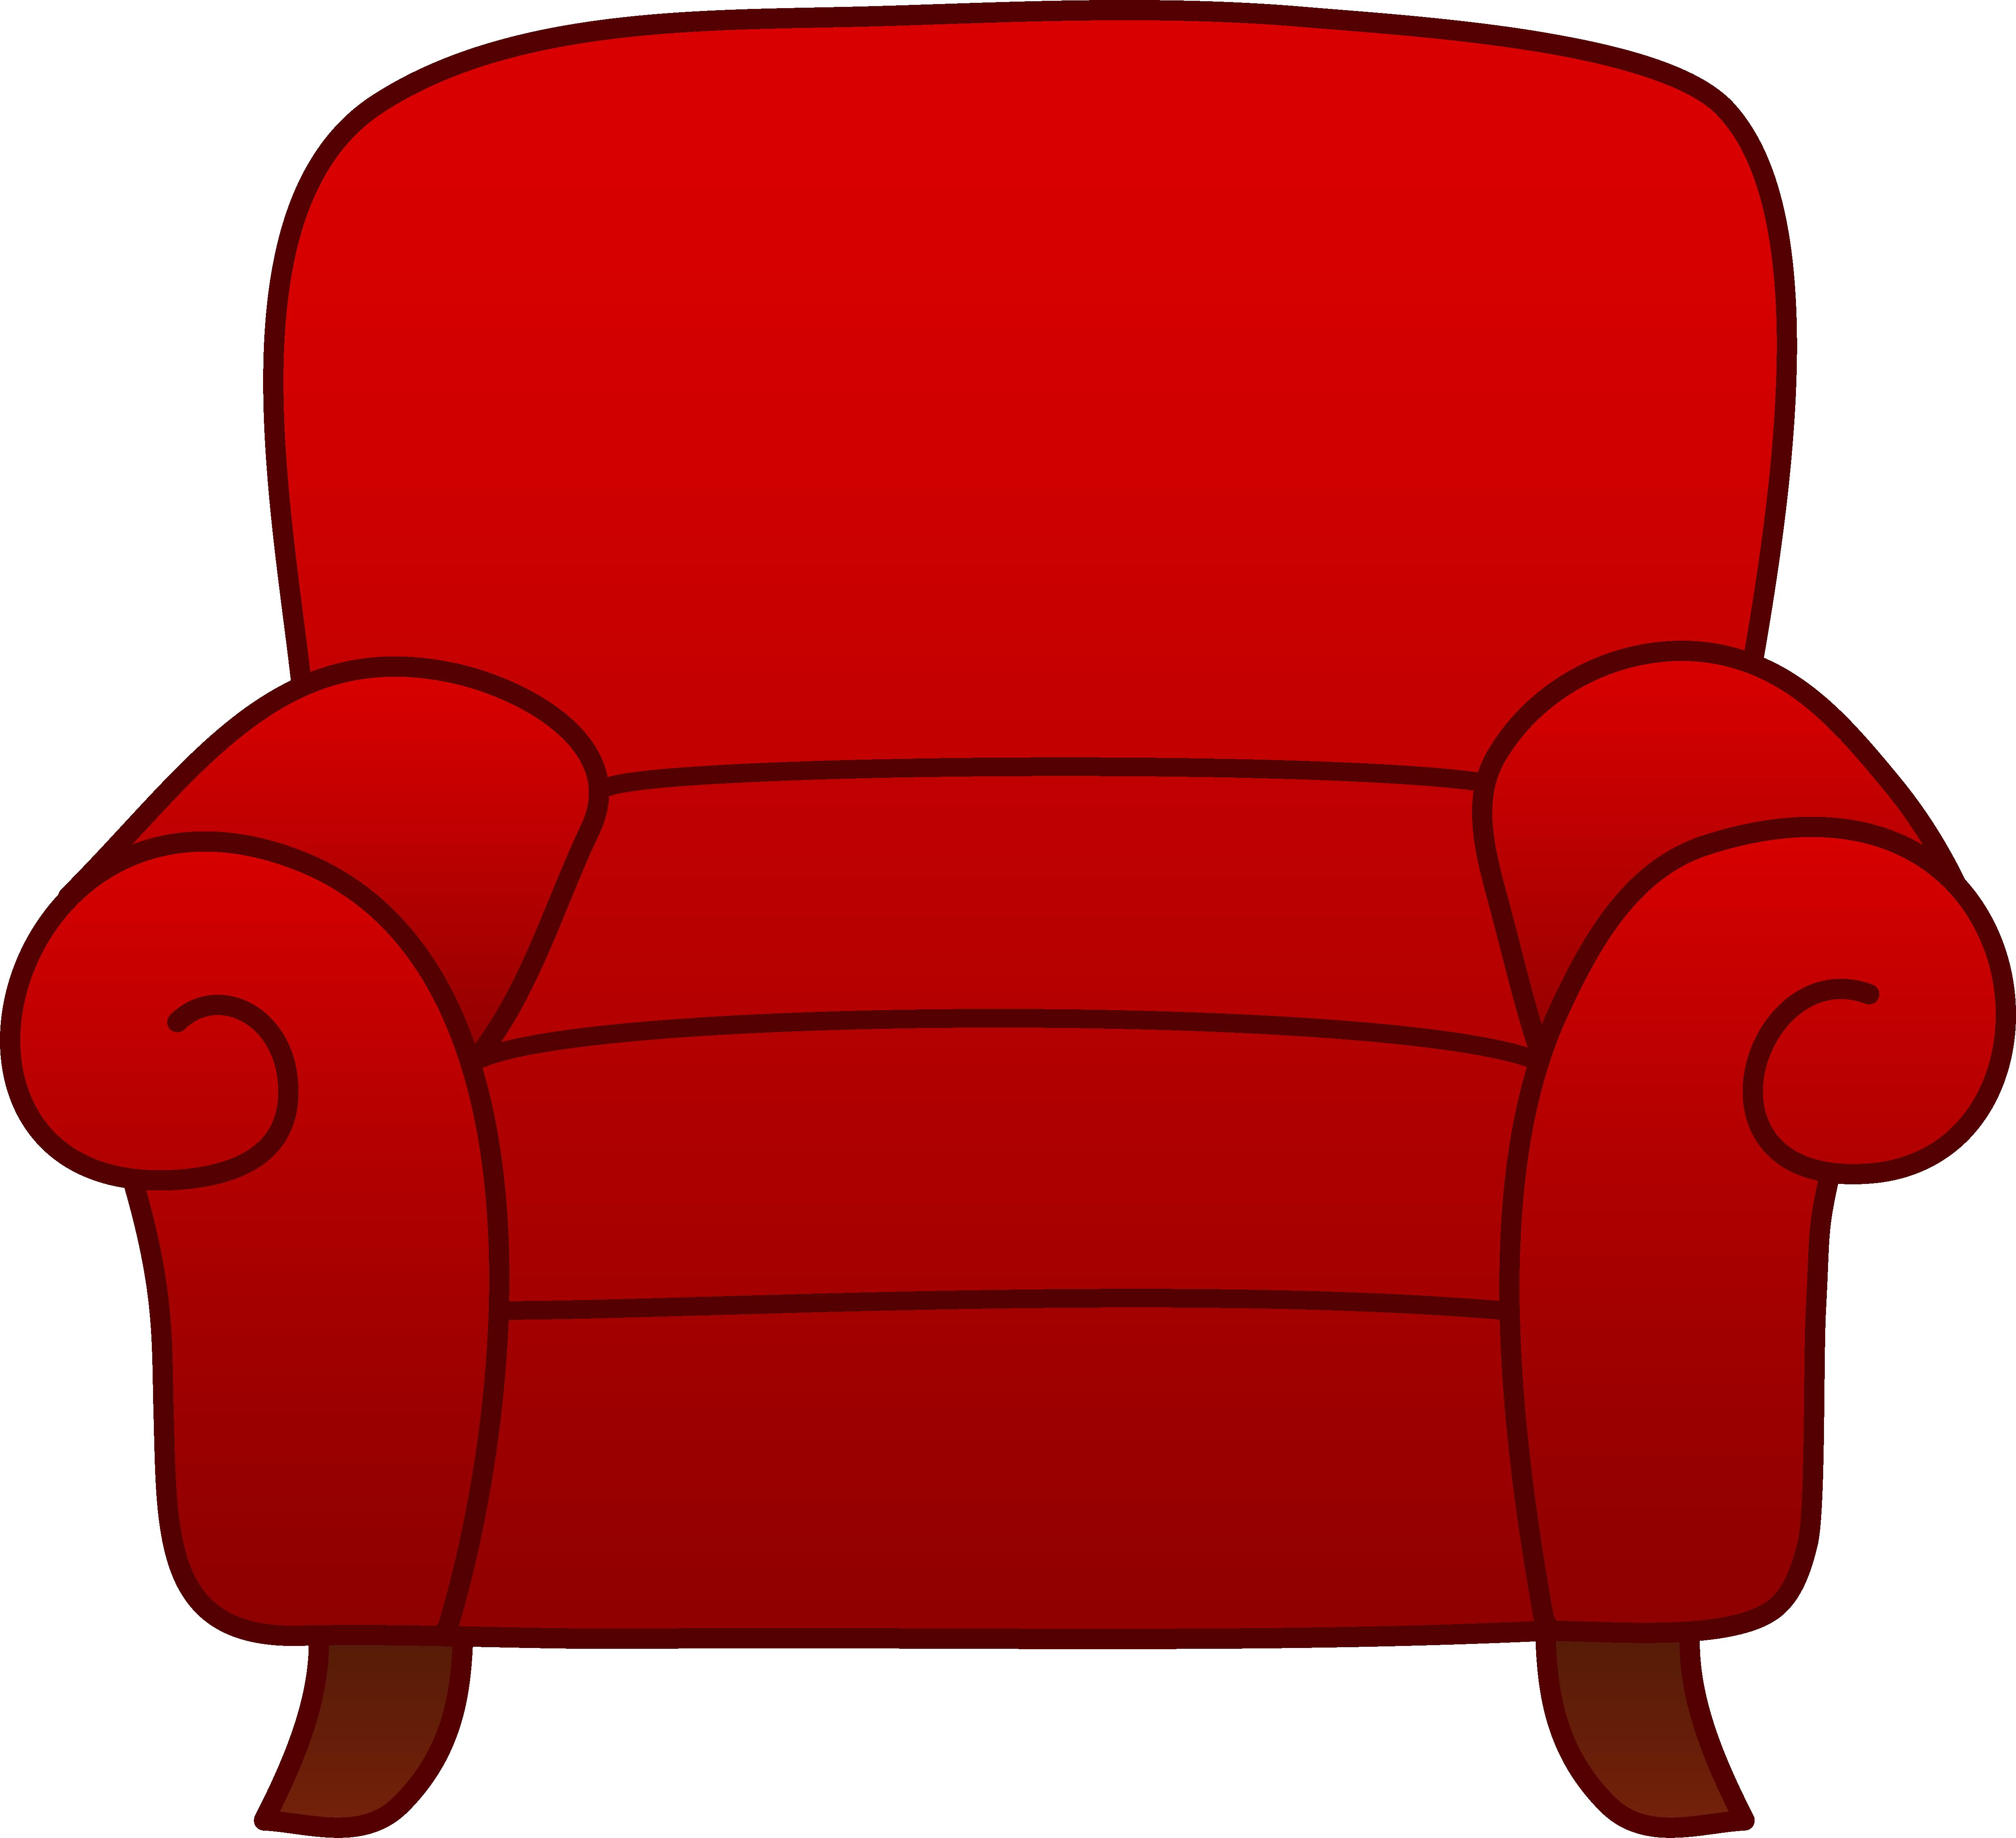 Free Cartoon Furniture Cliparts, Download Free Clip Art.